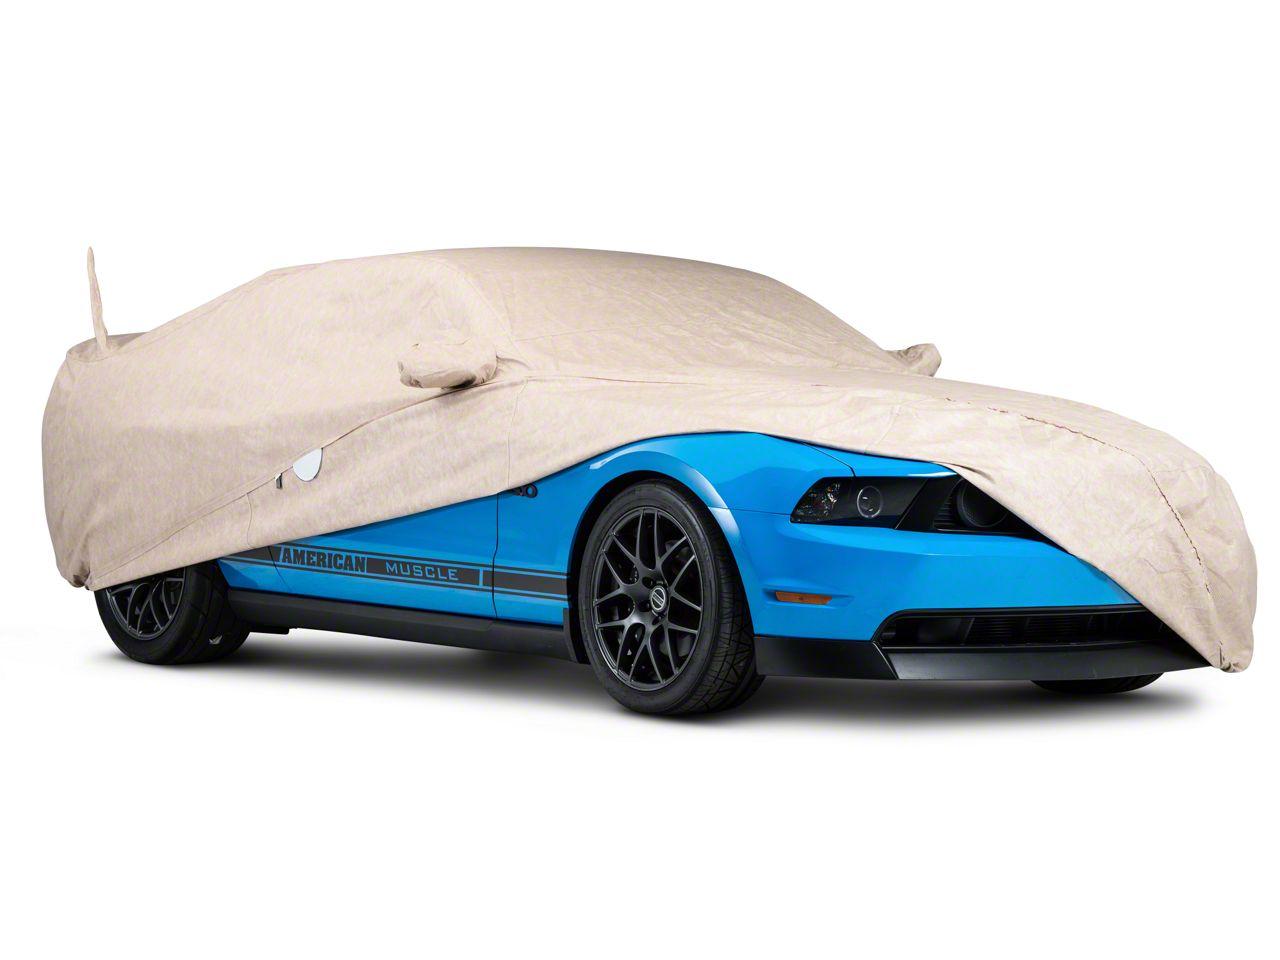 Covercraft Custom Fit Car Cover for Select Austin Healy Models FS44F5 Fleeced Satin Black